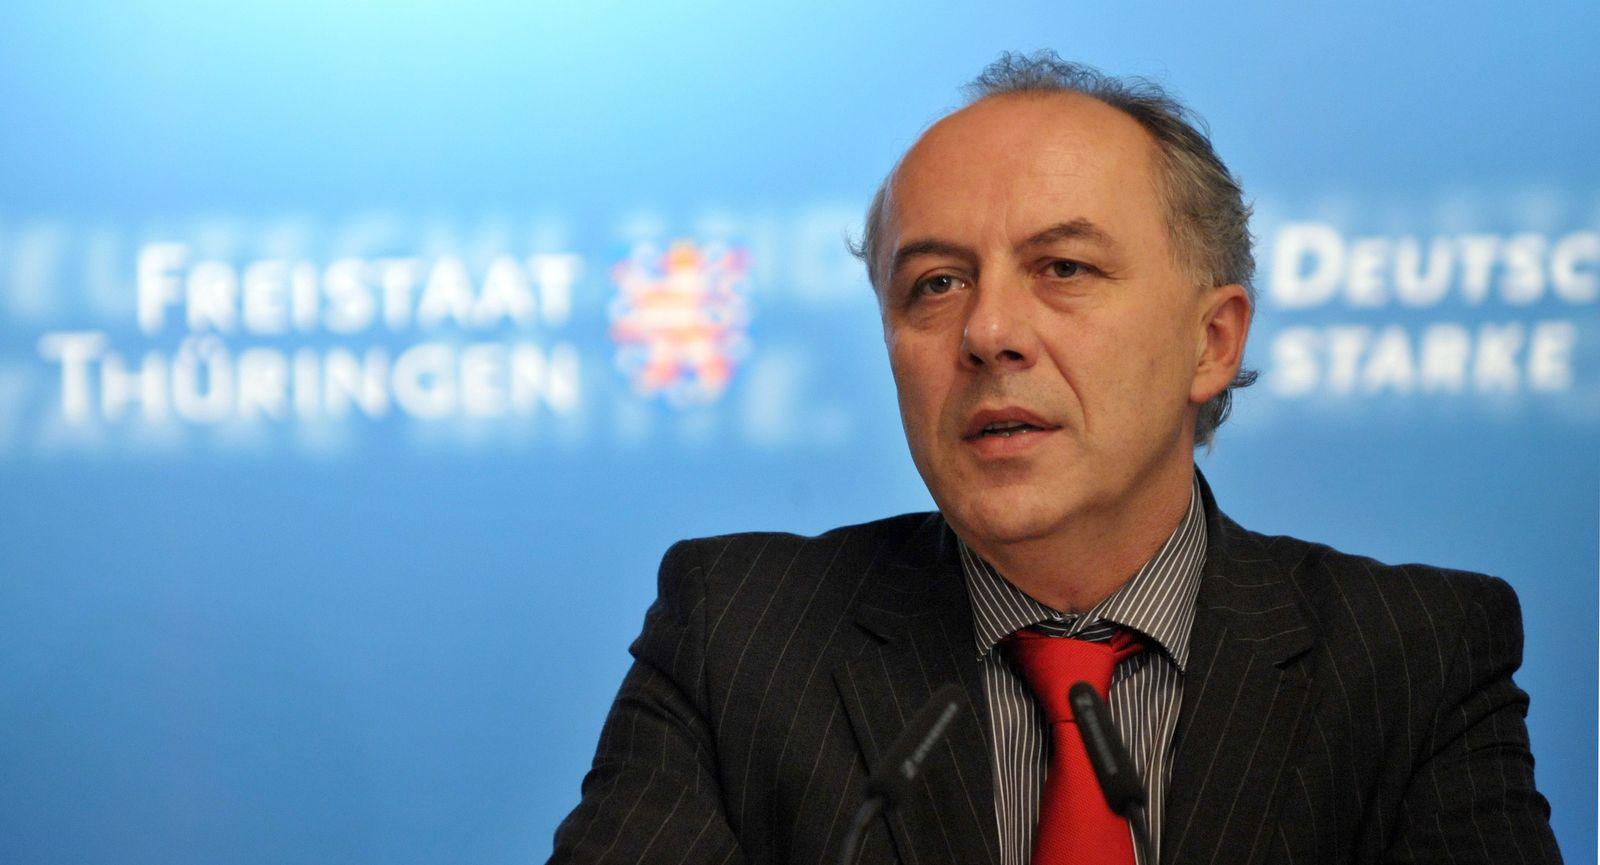 Matthias Machnig / SPD